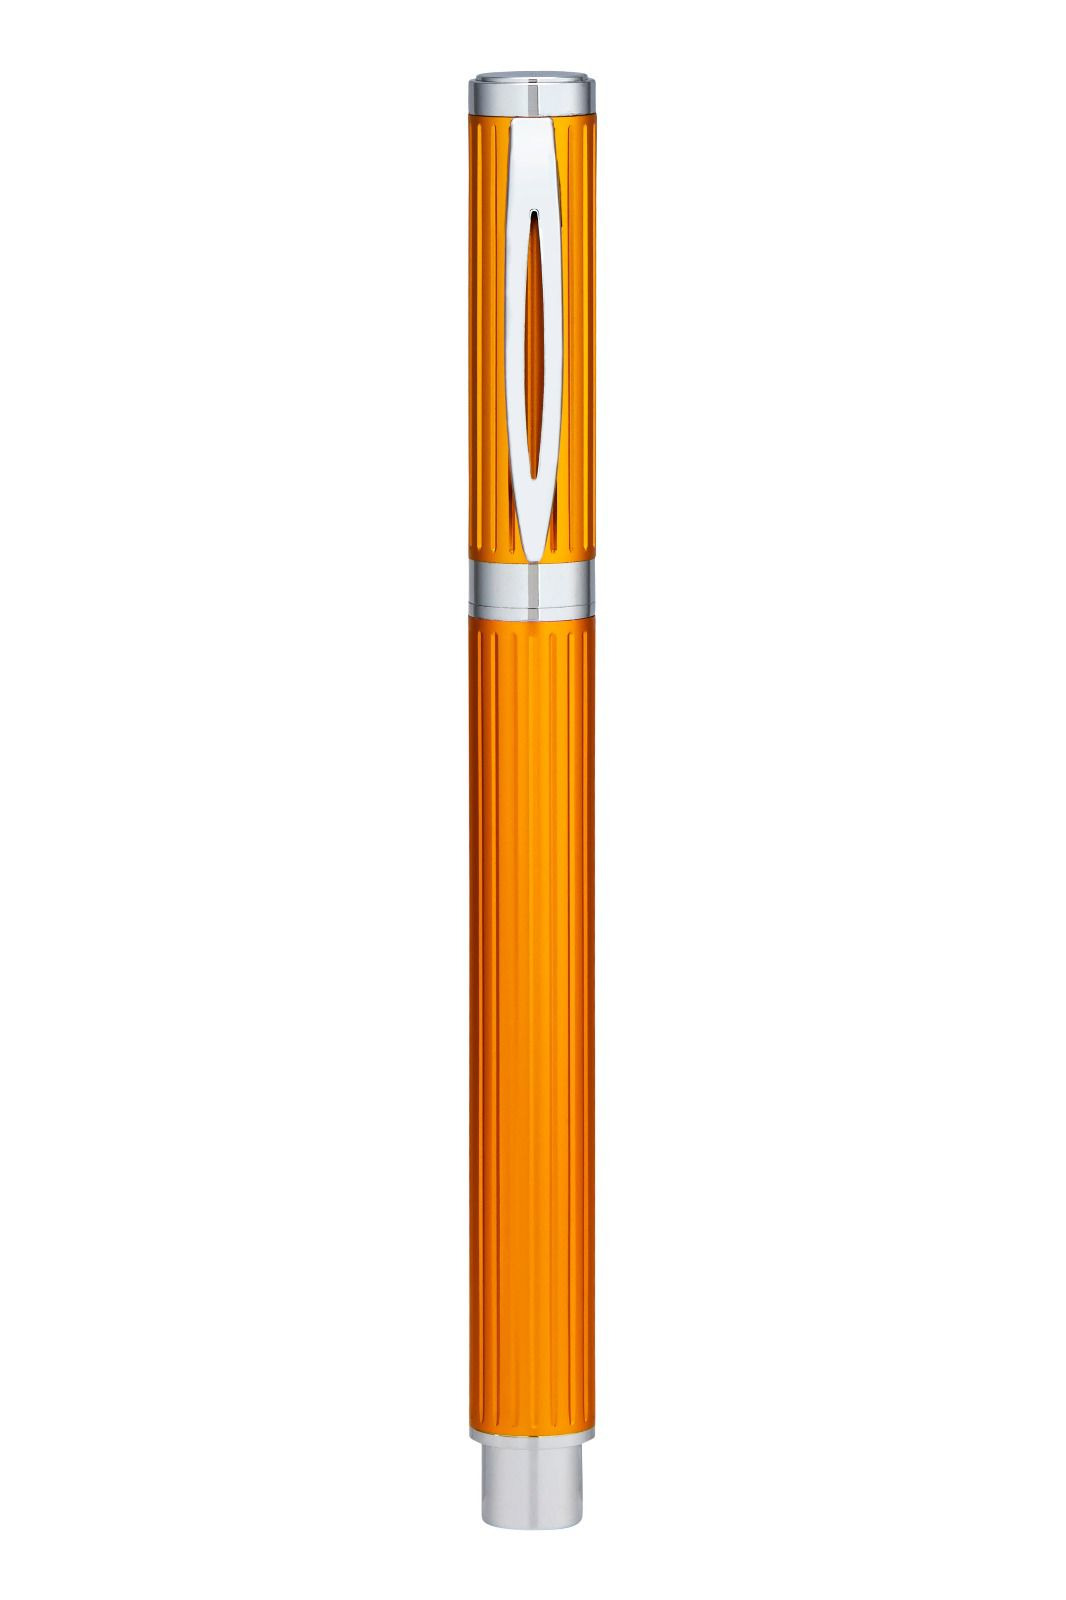 Yookers Fiberpen Eros amarela C/ Conversor De Tinta.